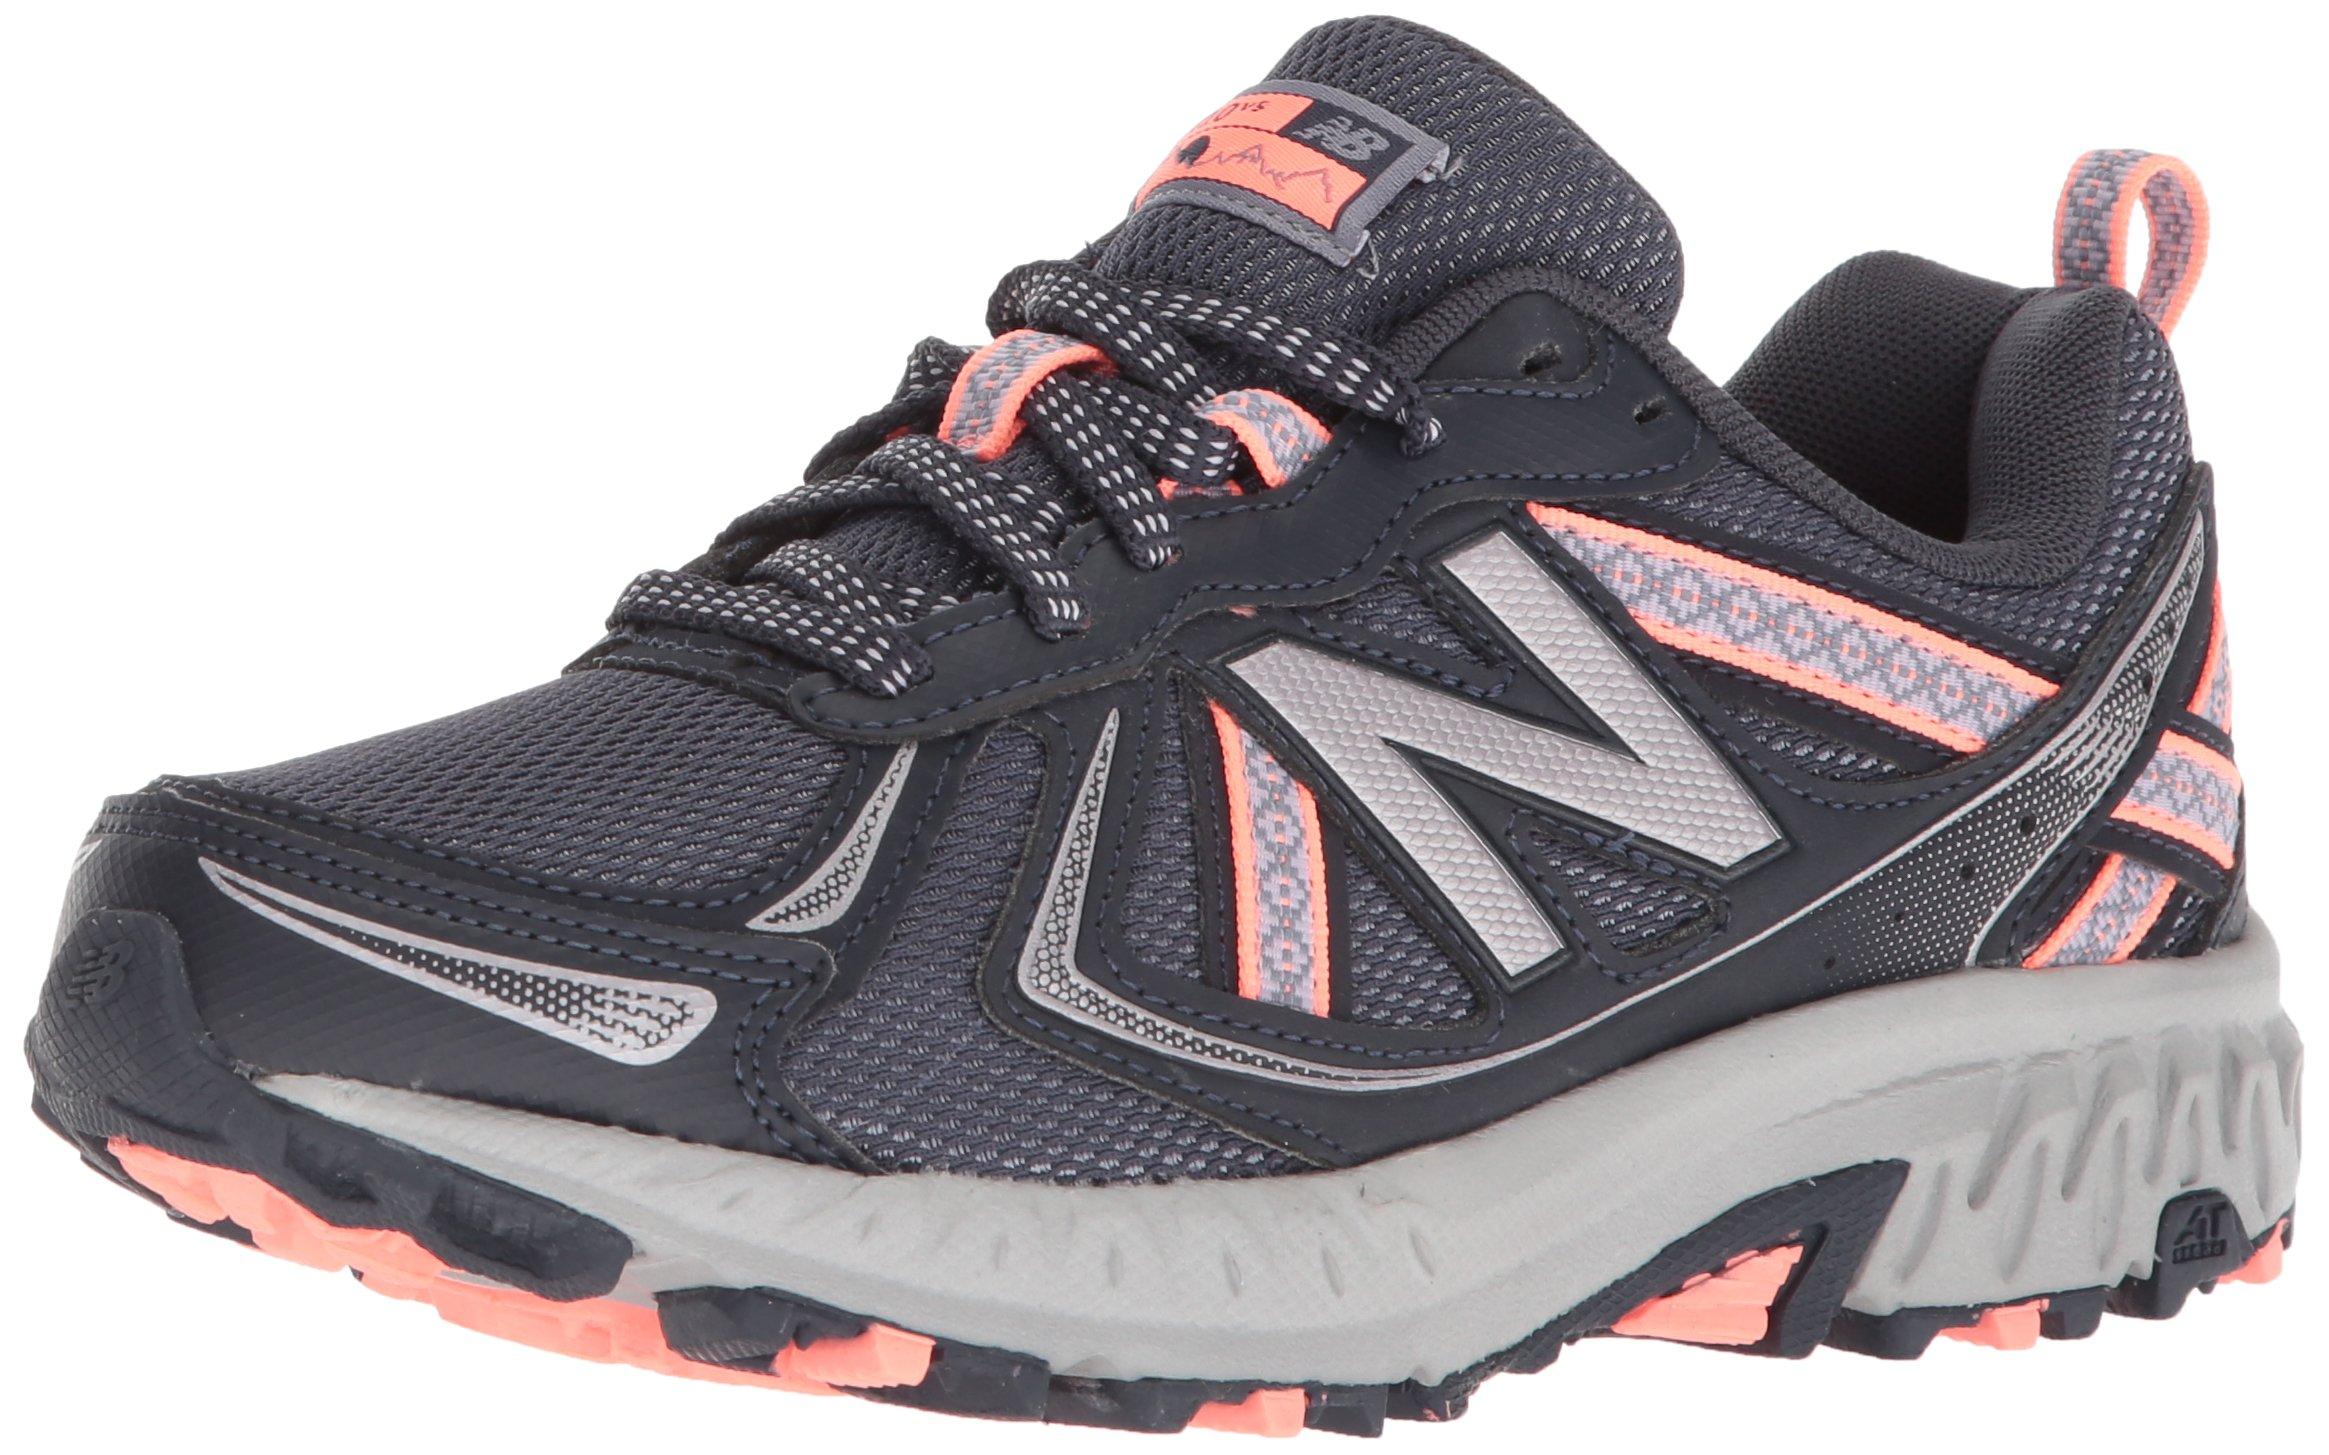 New Balance Women's WT410v5 Cushioning Trail Running Shoe, Thunder, 7.5 D US by New Balance